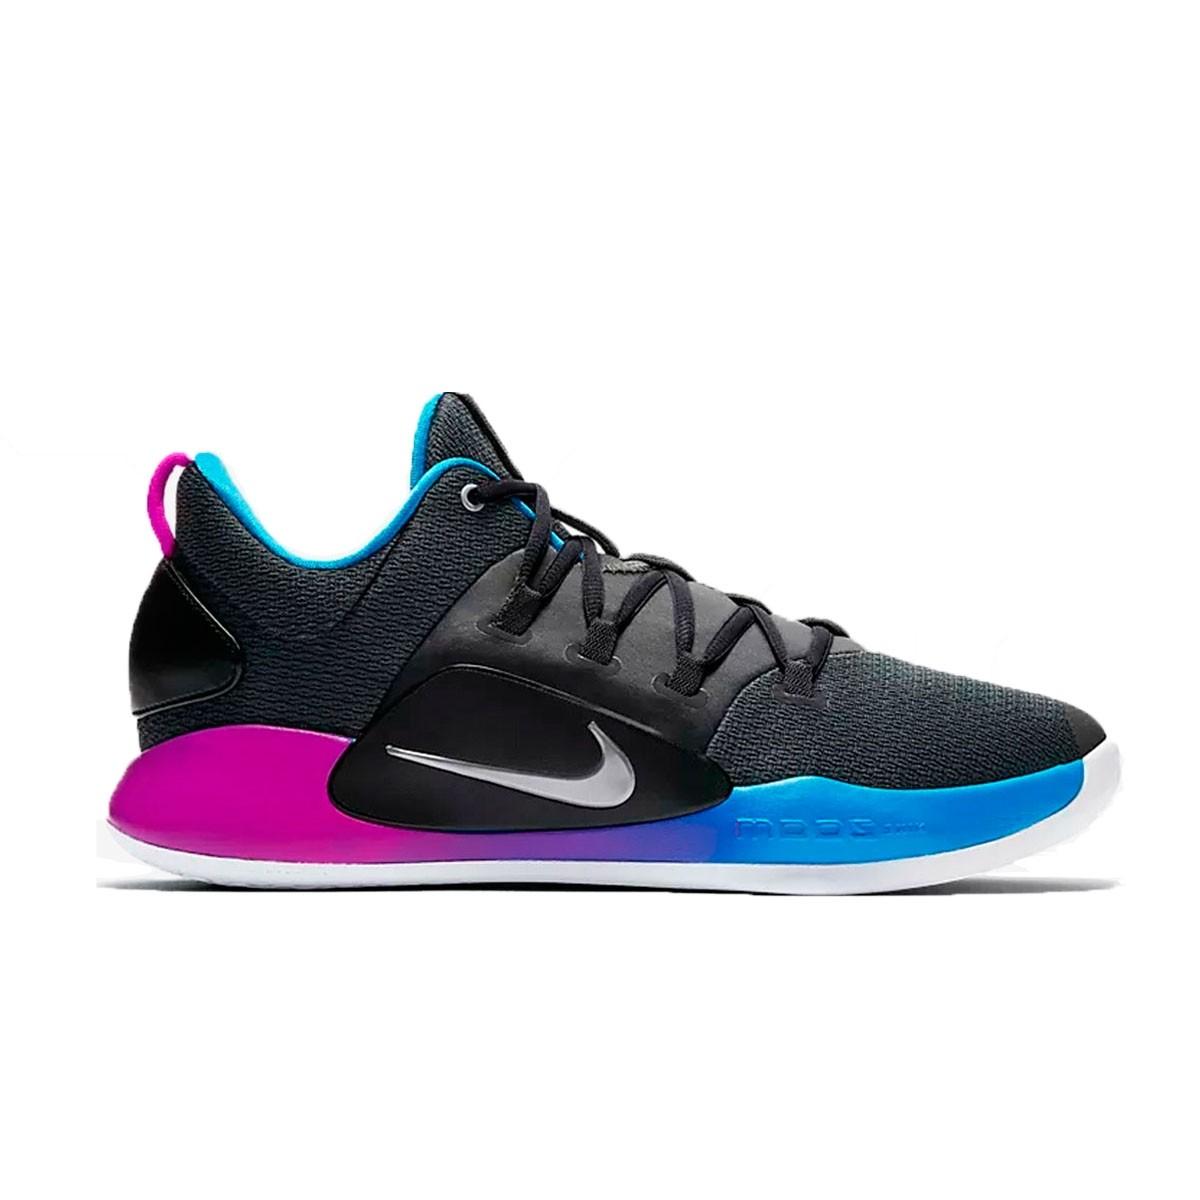 timeless design 21b9c 50599 Nike Hyperdunk X Low 2018 'Huarache'